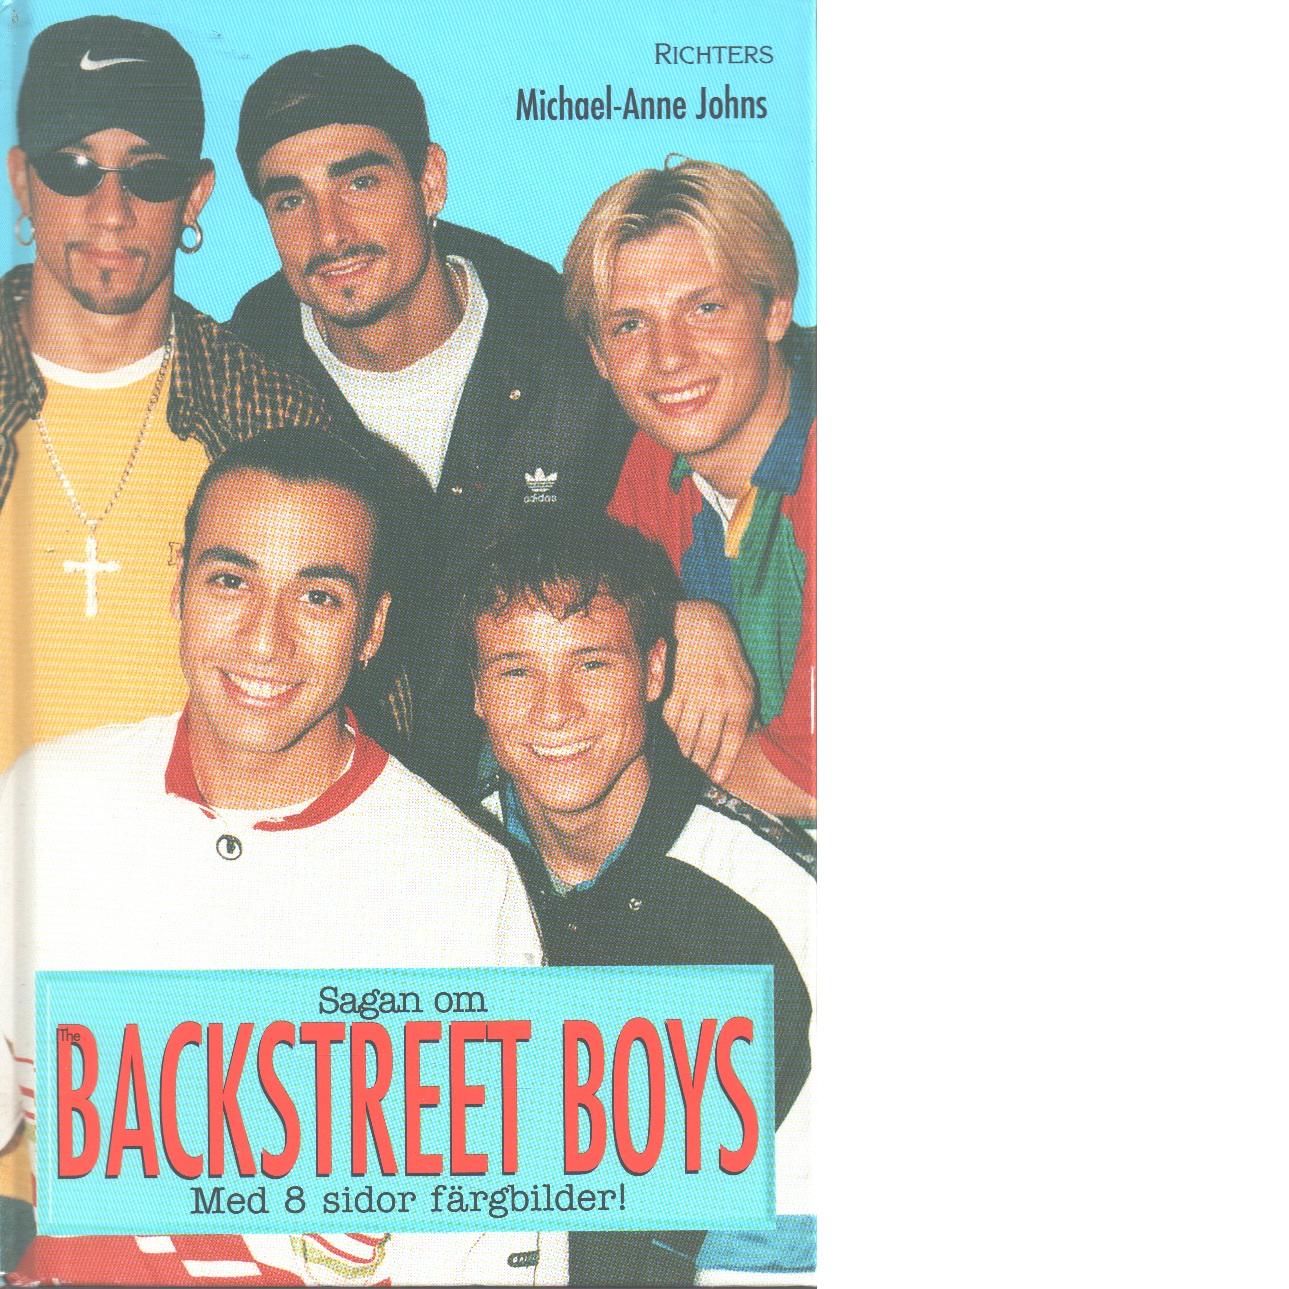 Sagan om the Backstreet Boys - Johns, Michael-Anne